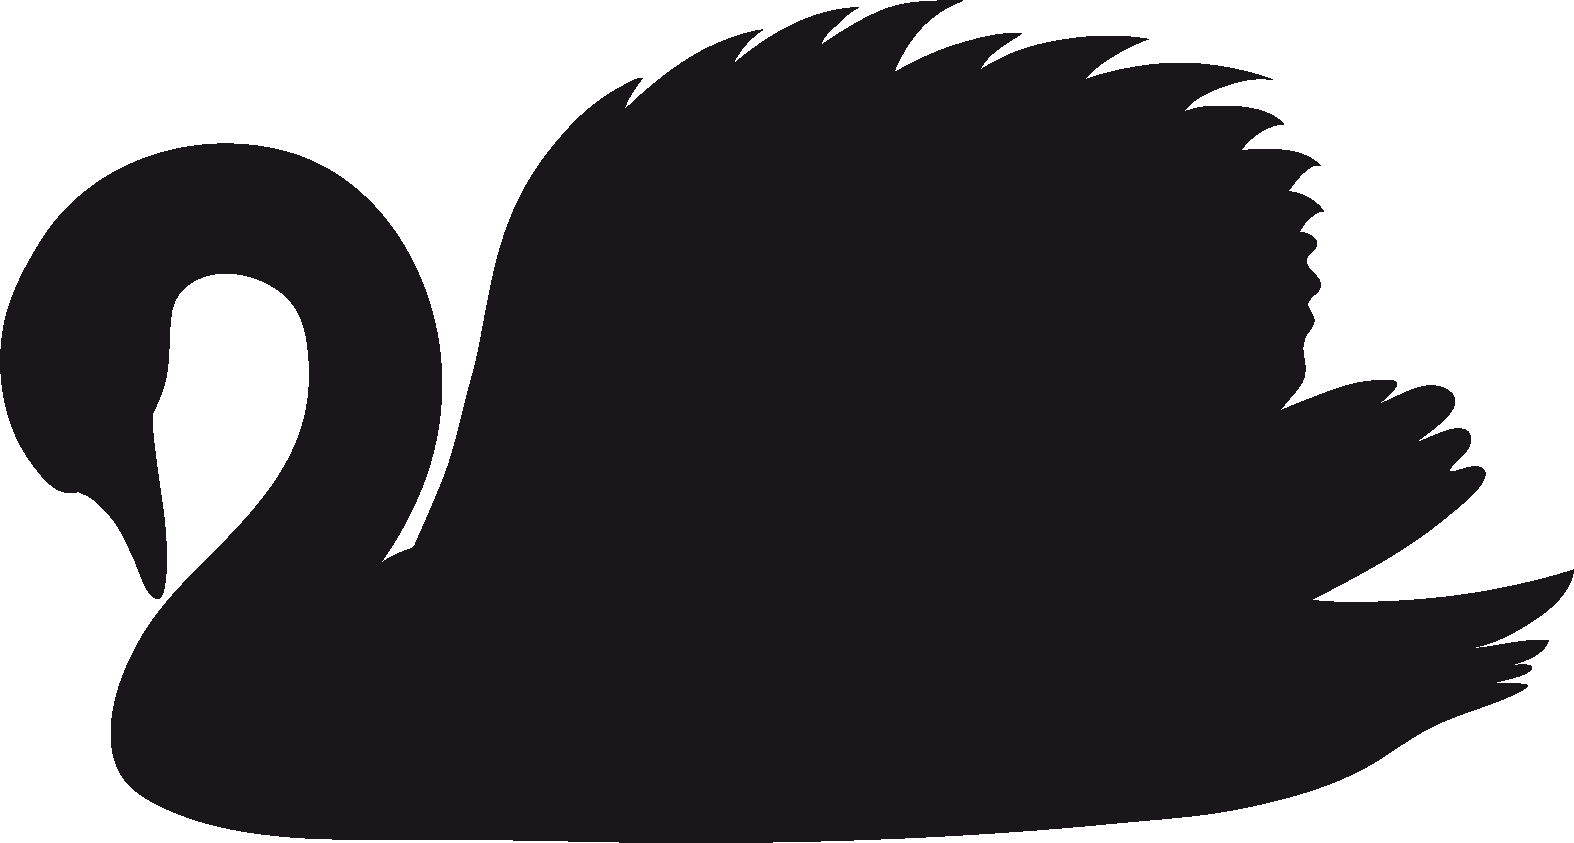 Clipart birds black swan. Png